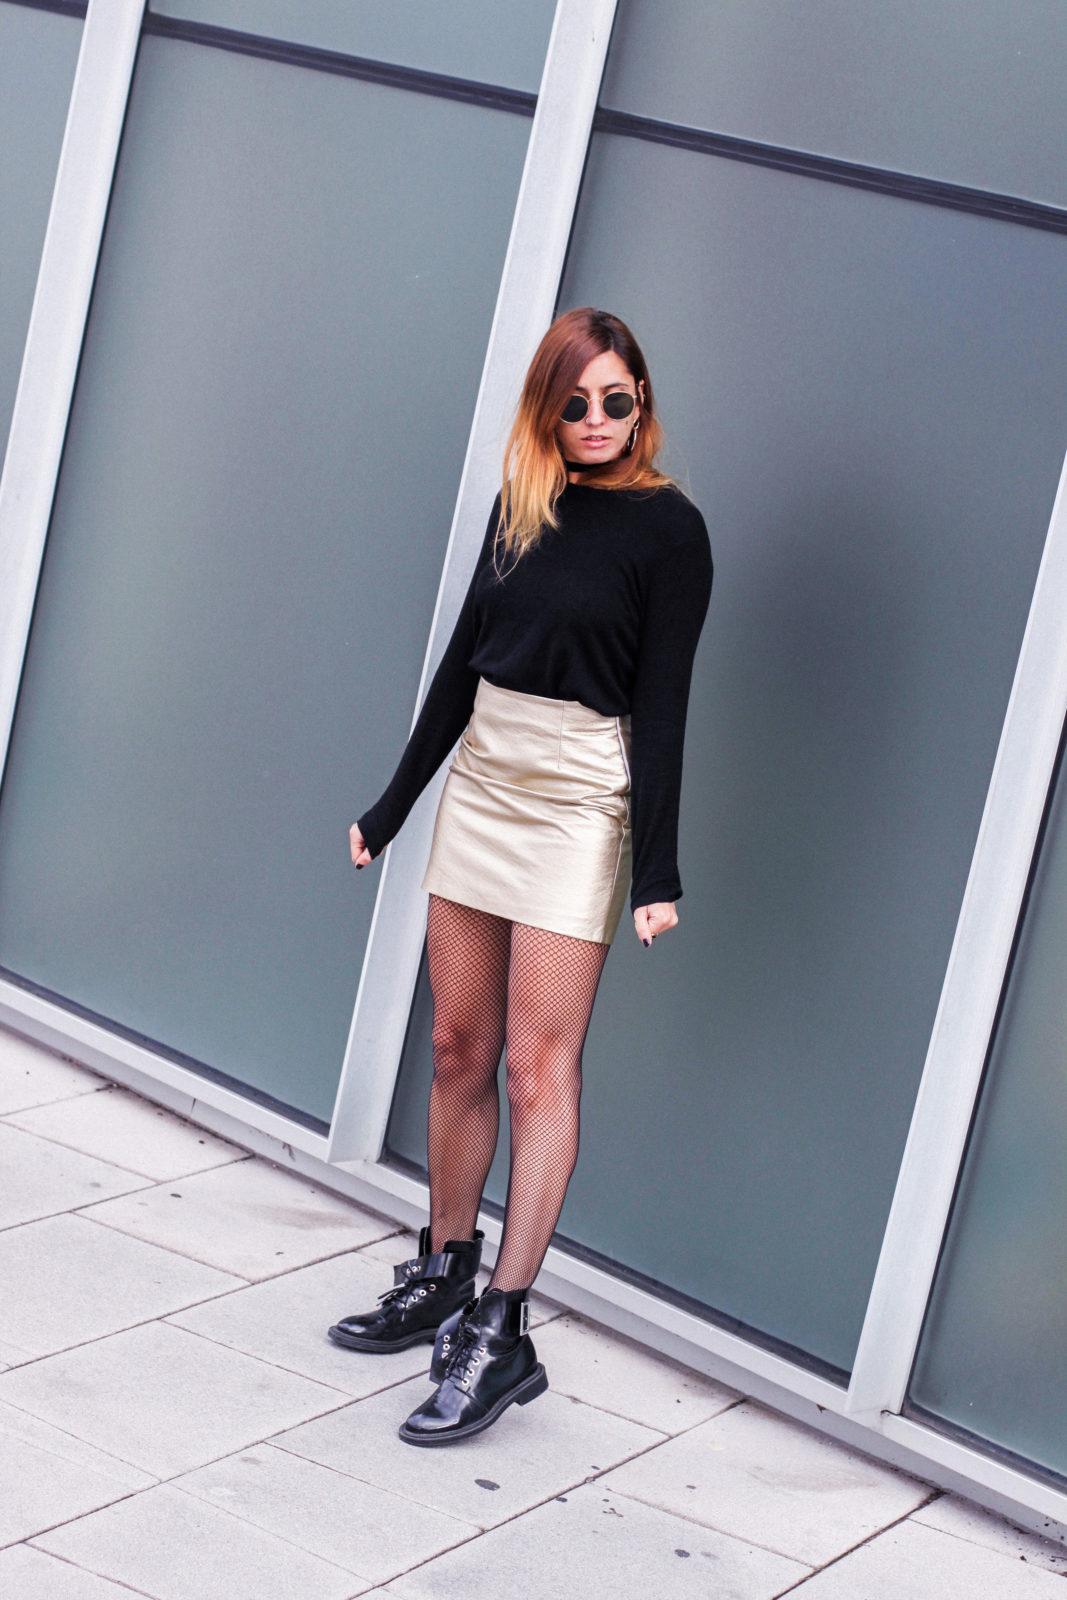 falda_dorada_shein_metalizado_medias_de_rejilla_choker_donkeycool_street_style_trends_2016-33